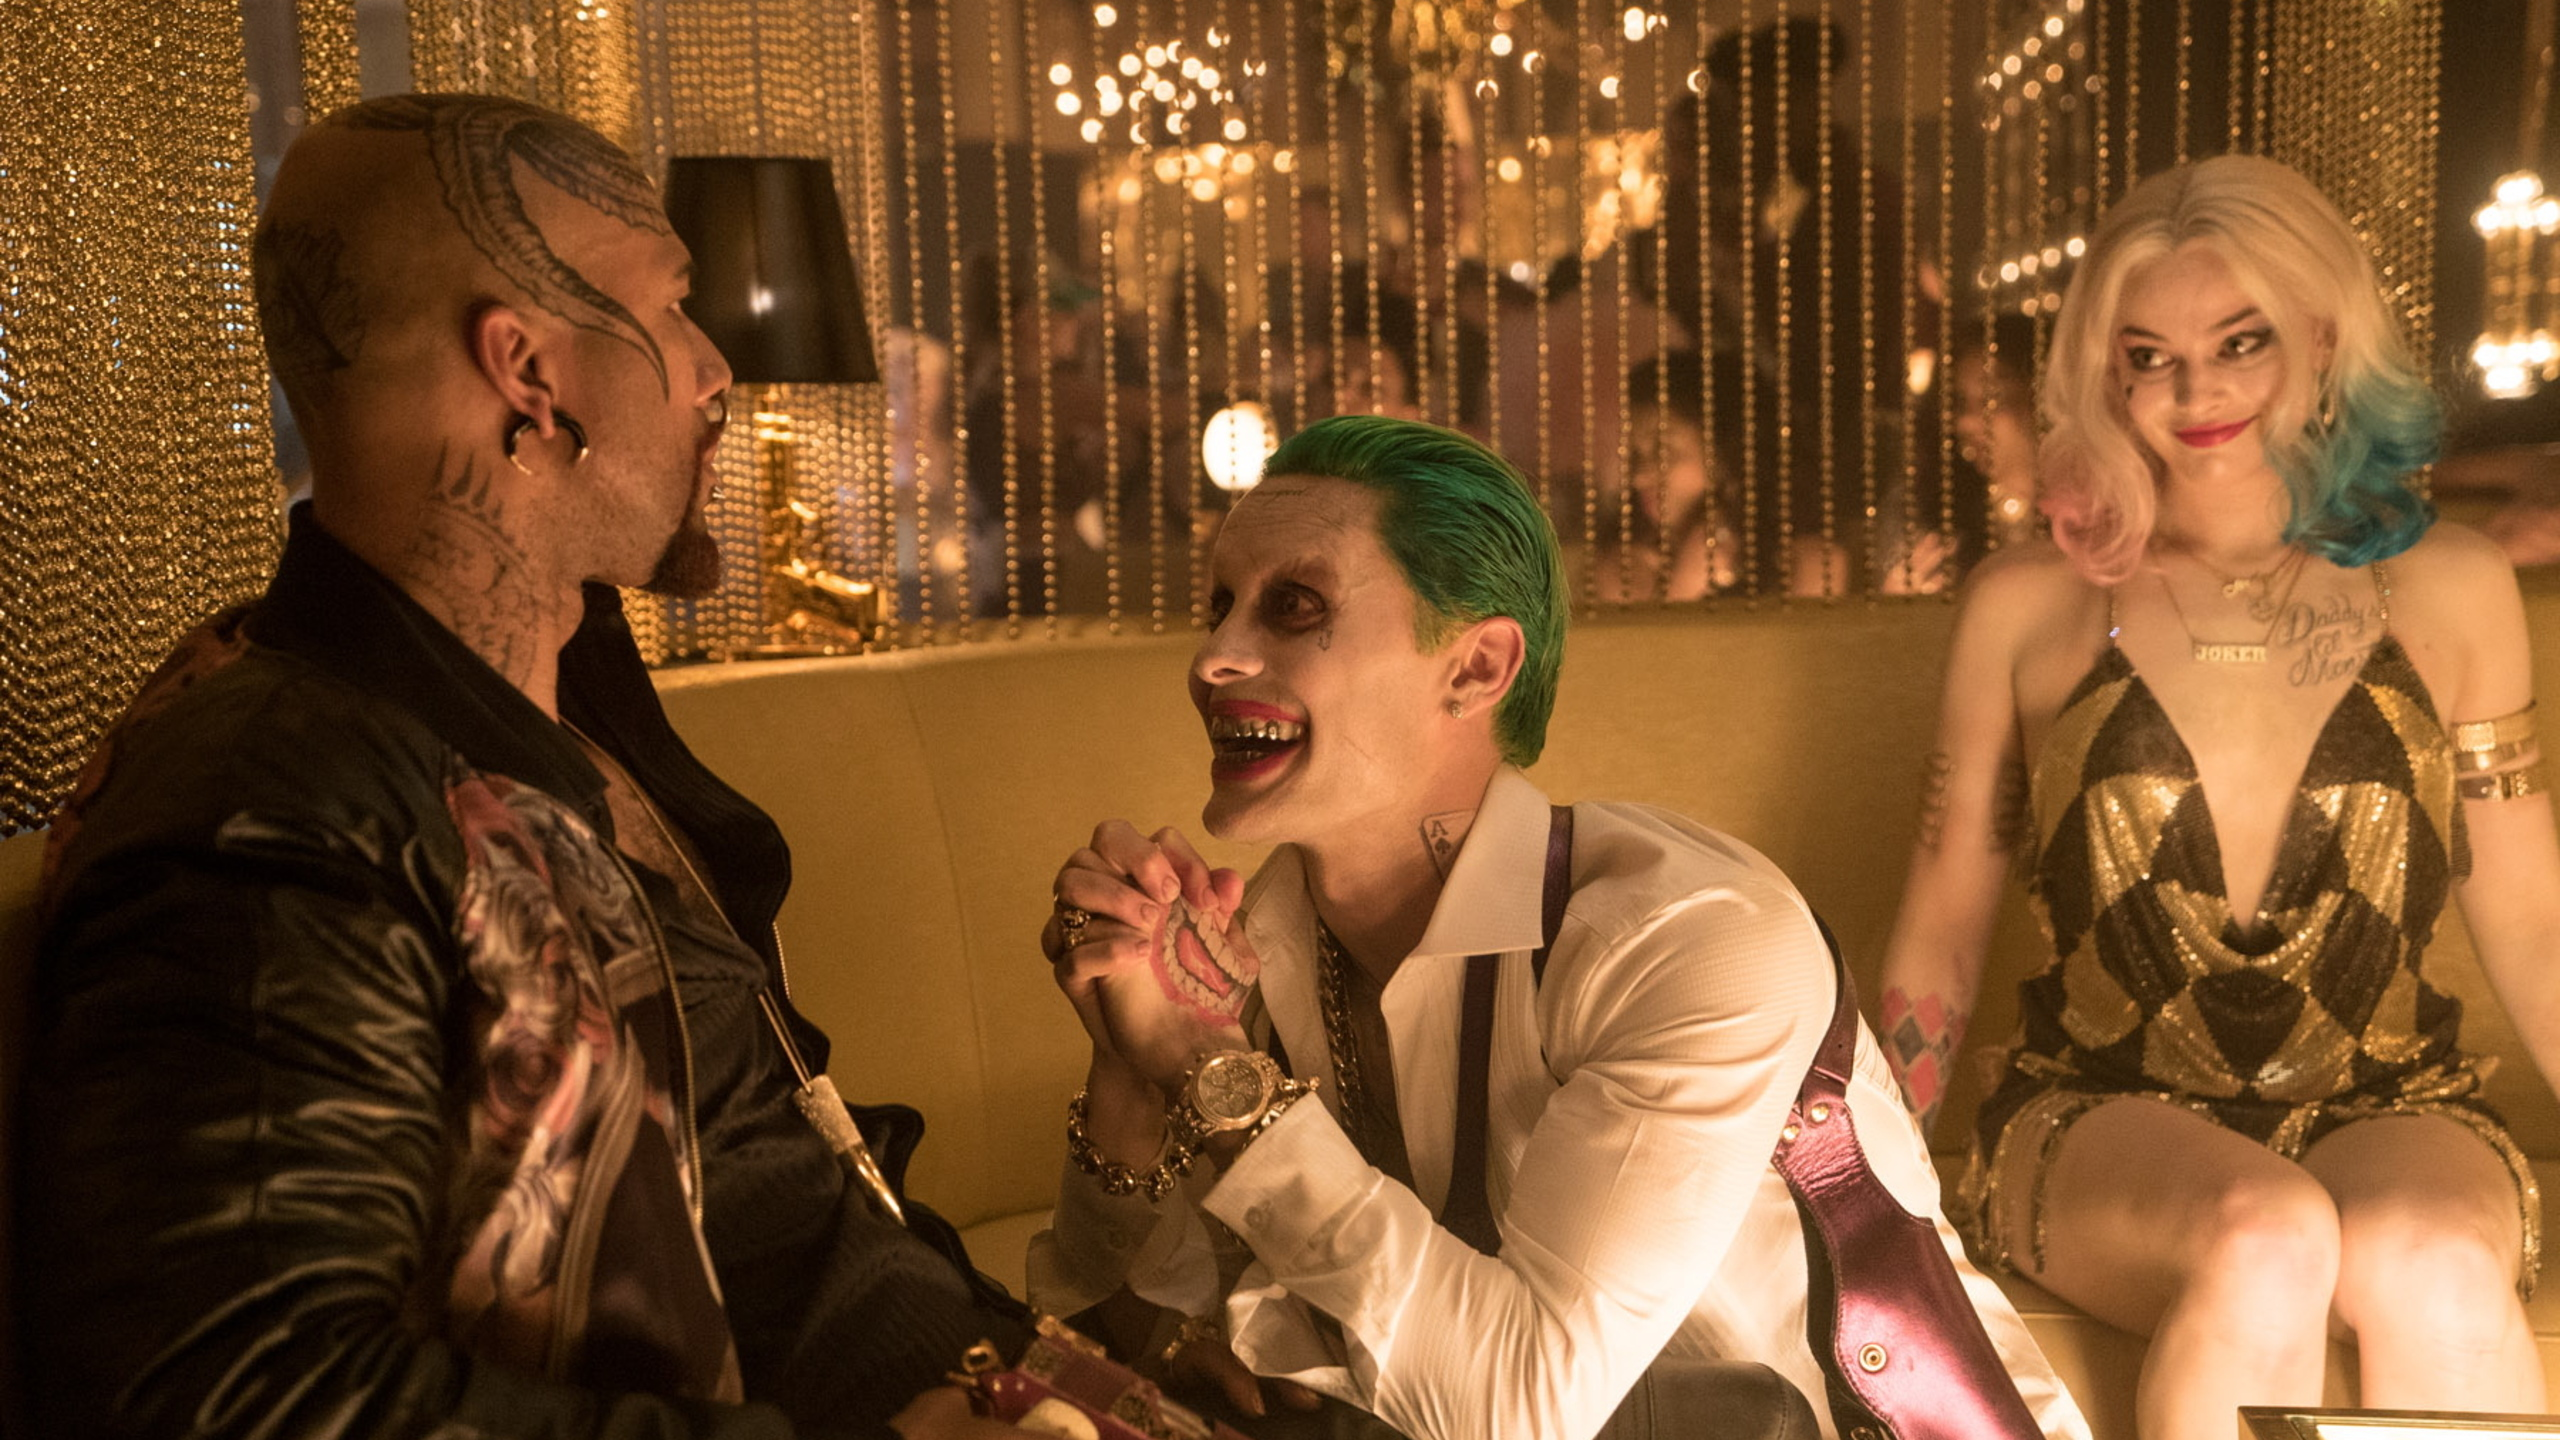 2560x1440 Joker Harley Quinn Suicide Squad 1440p Resolution Hd 4k